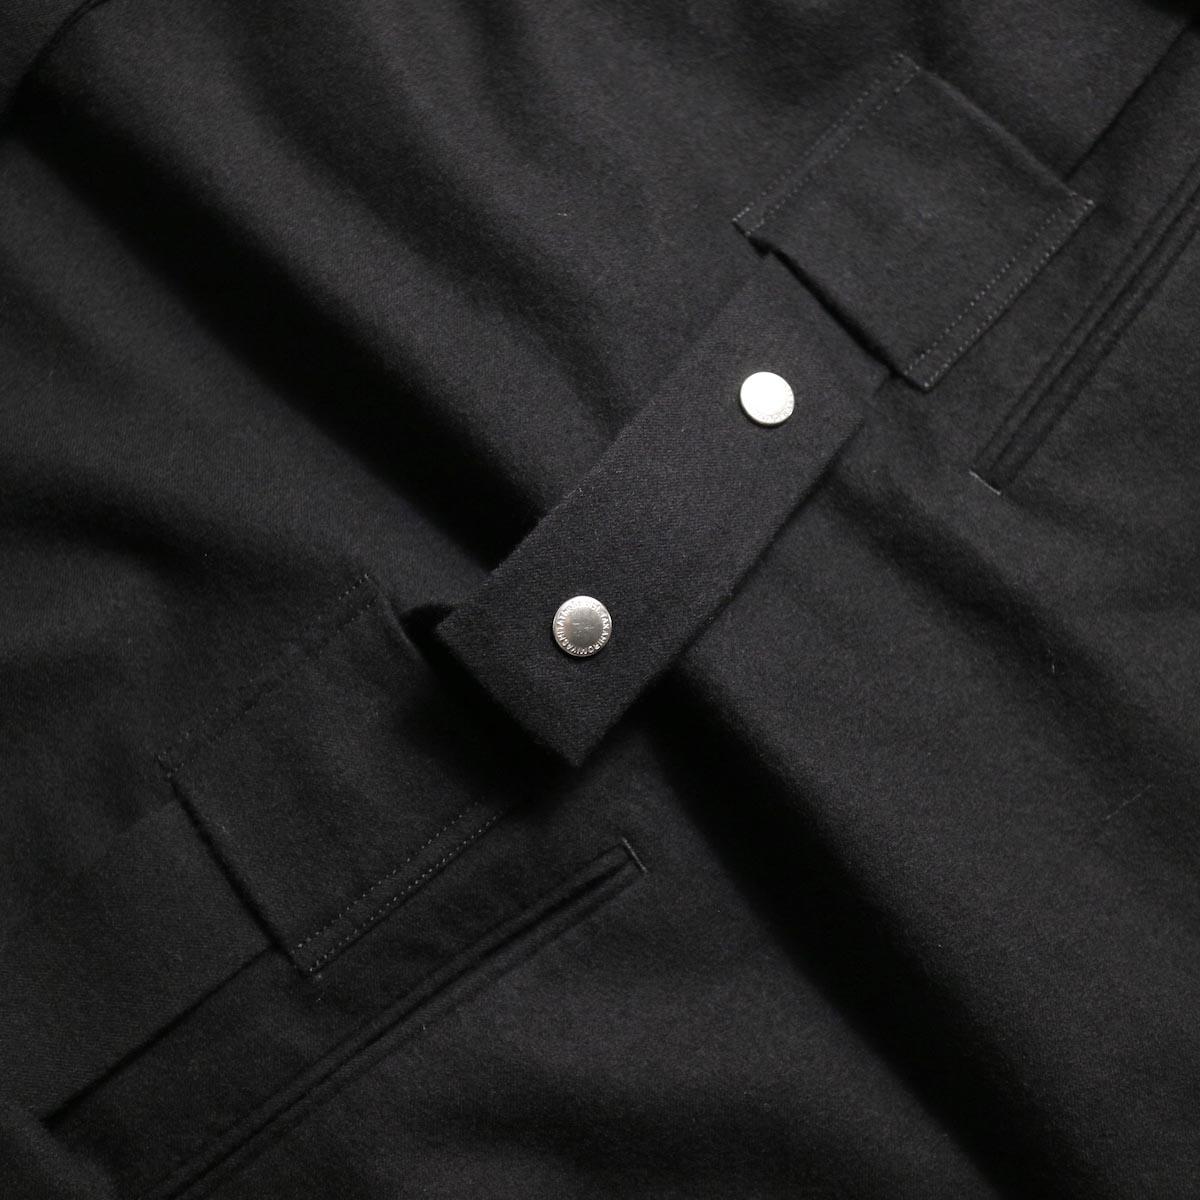 The Soloist / sj.0023b crew neck strapped medical jacket.ストラップベルト